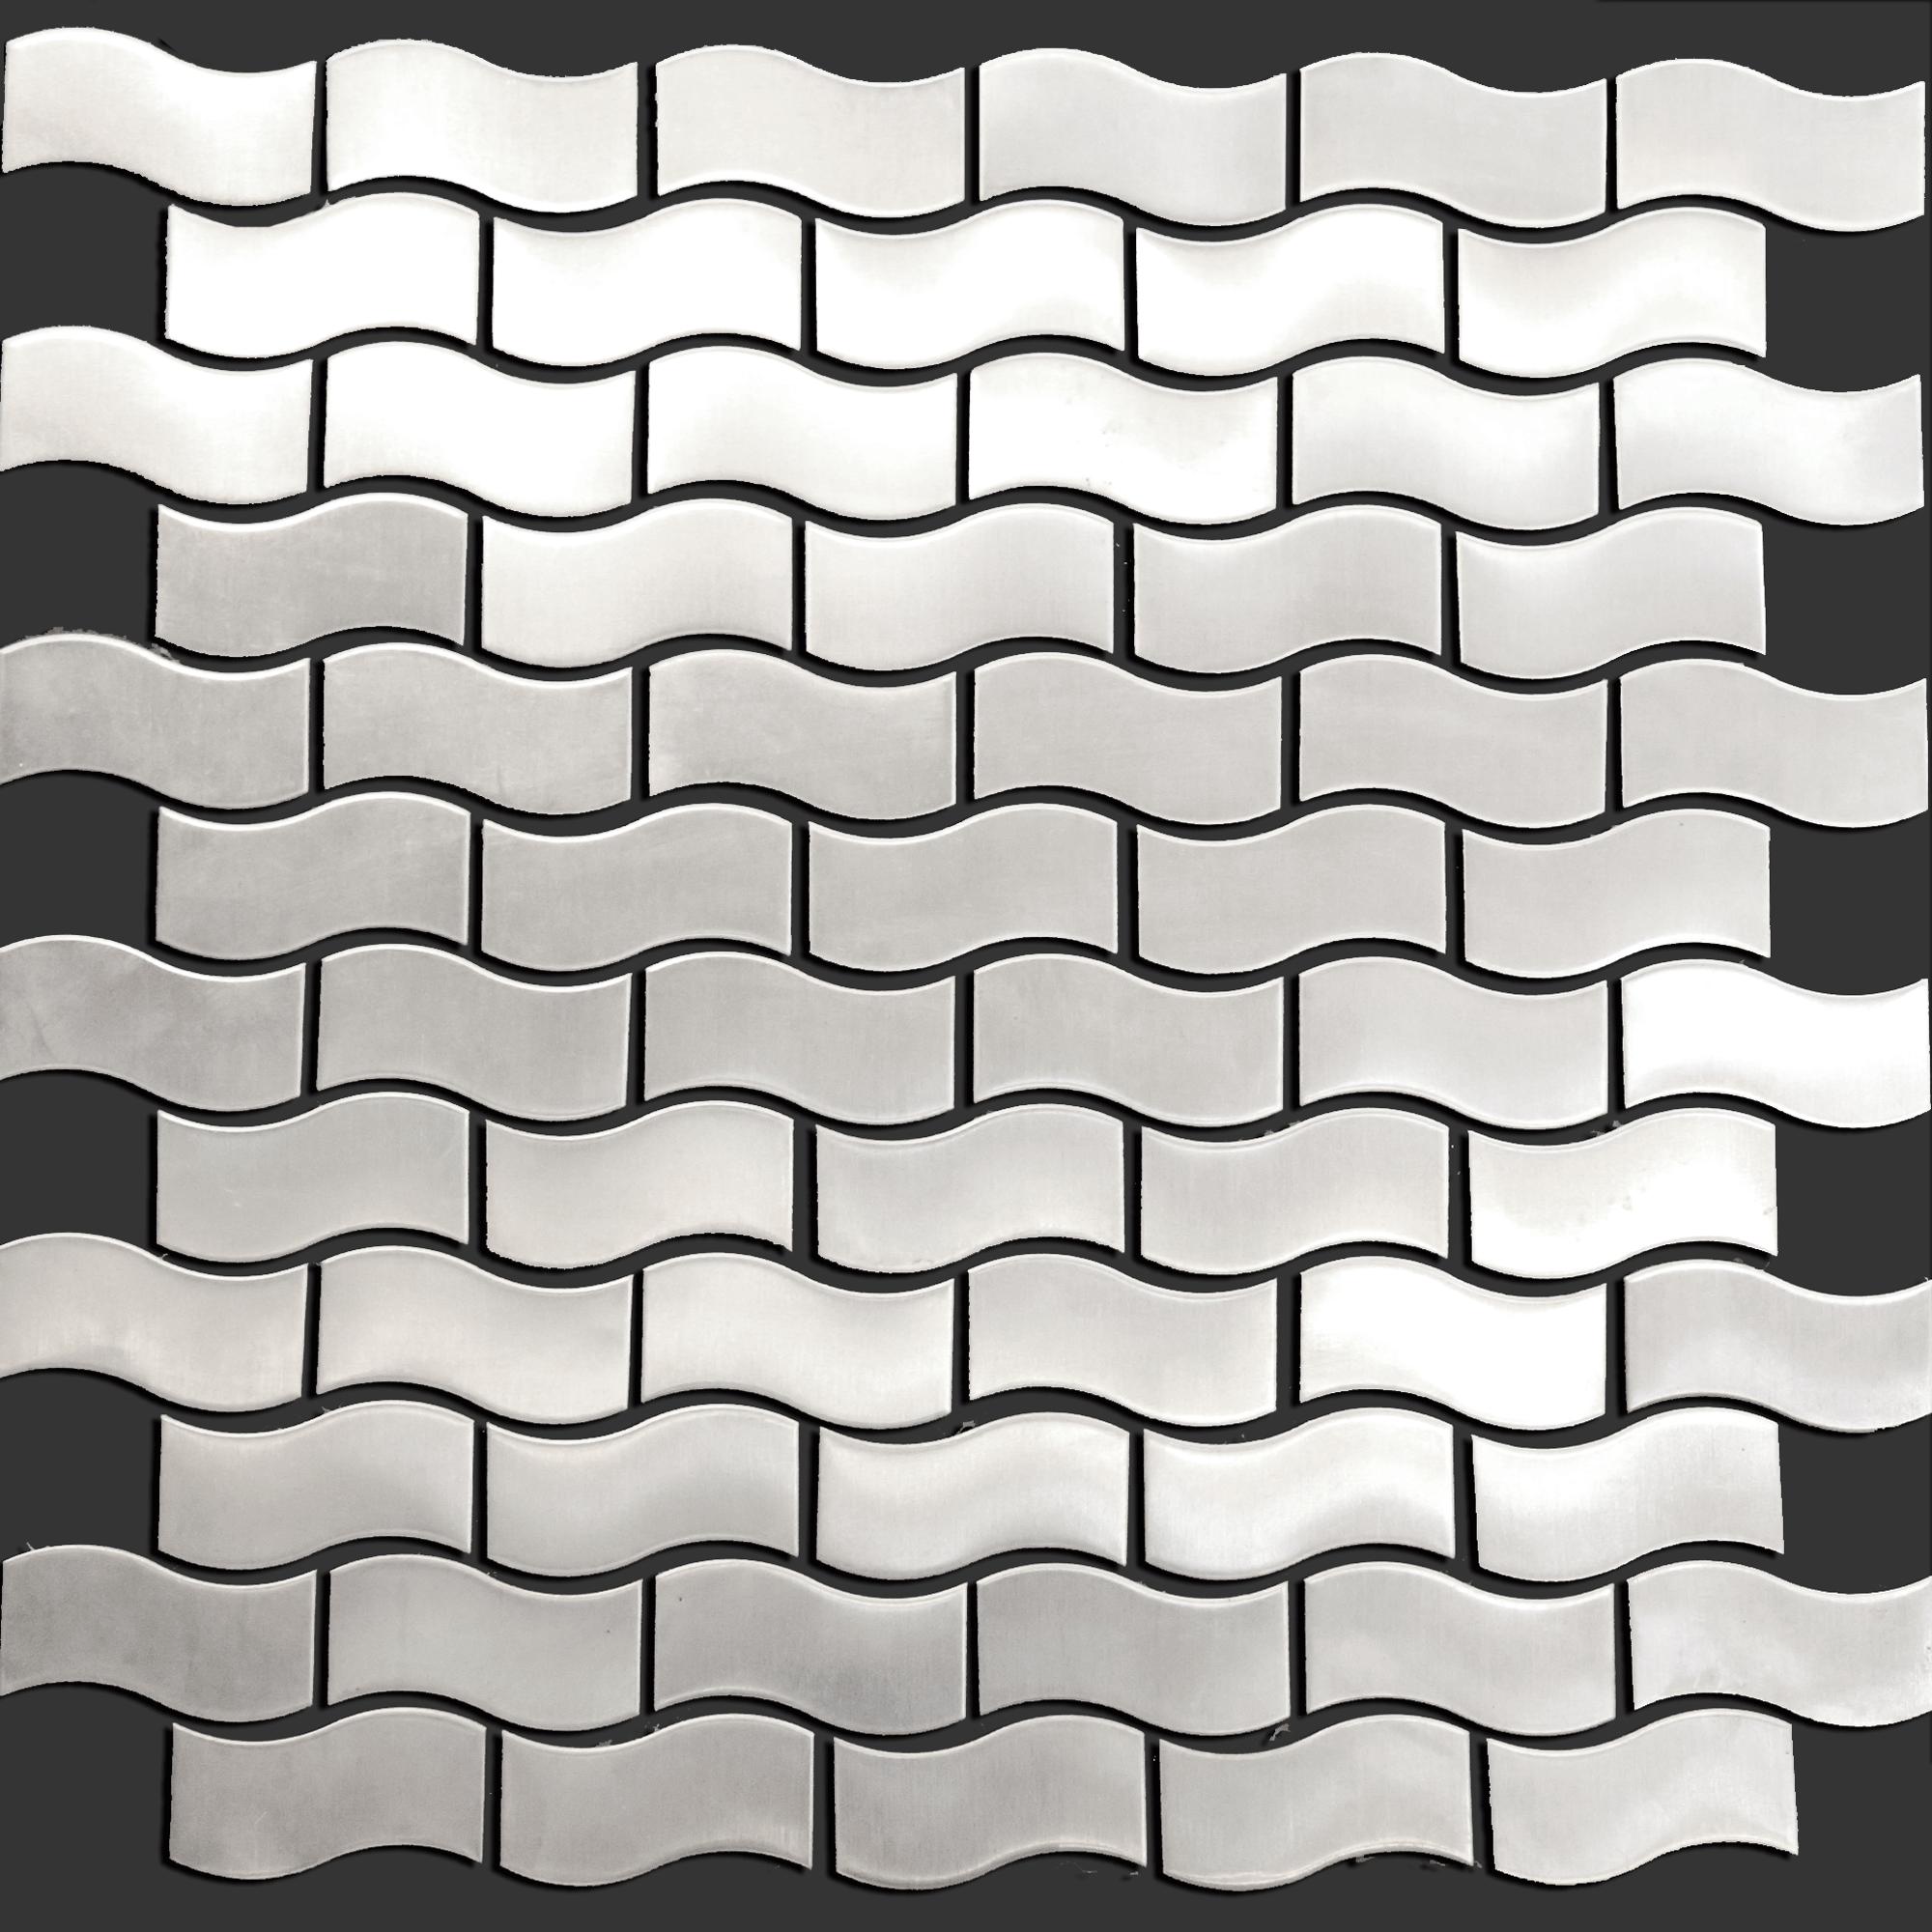 - Stainless Steel Mosaic Tile 3D Raise Bridge Pattern Backsplash